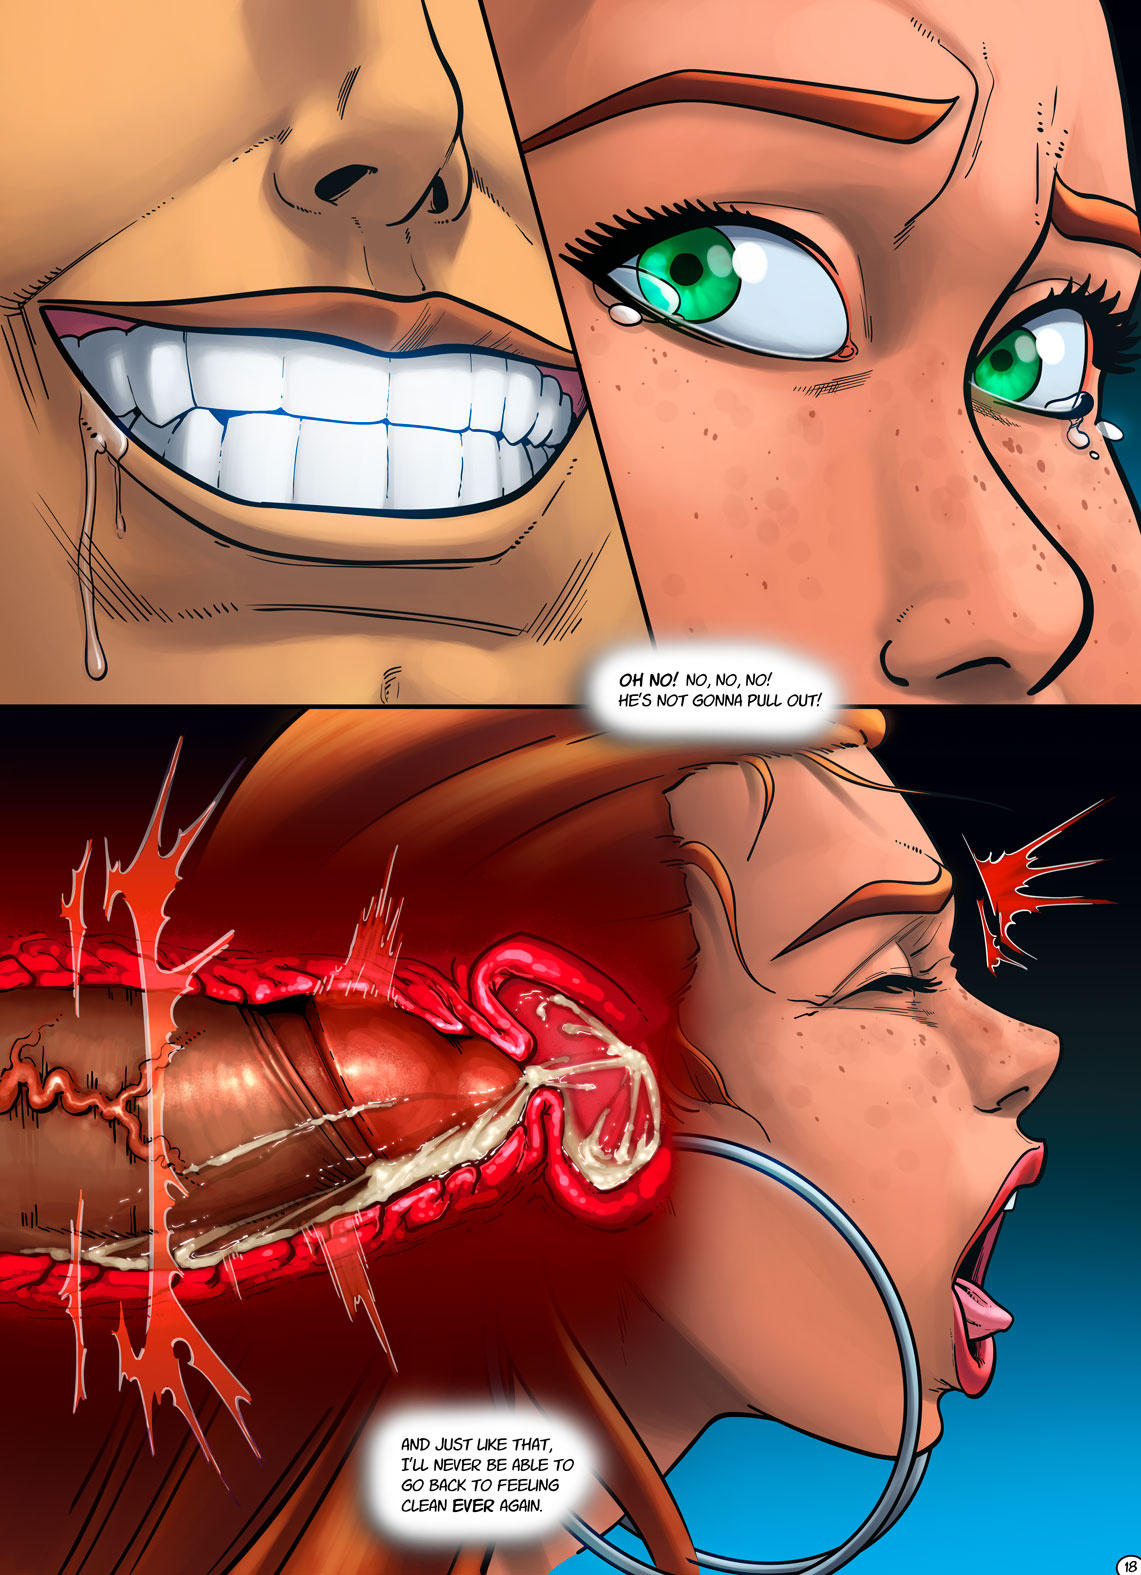 Mary Jane - Break Your Vows porn comics Oral sex, Bikini, Blowjob, Creampie, Cum Swallow, Deepthroat, Straight, X-Ray